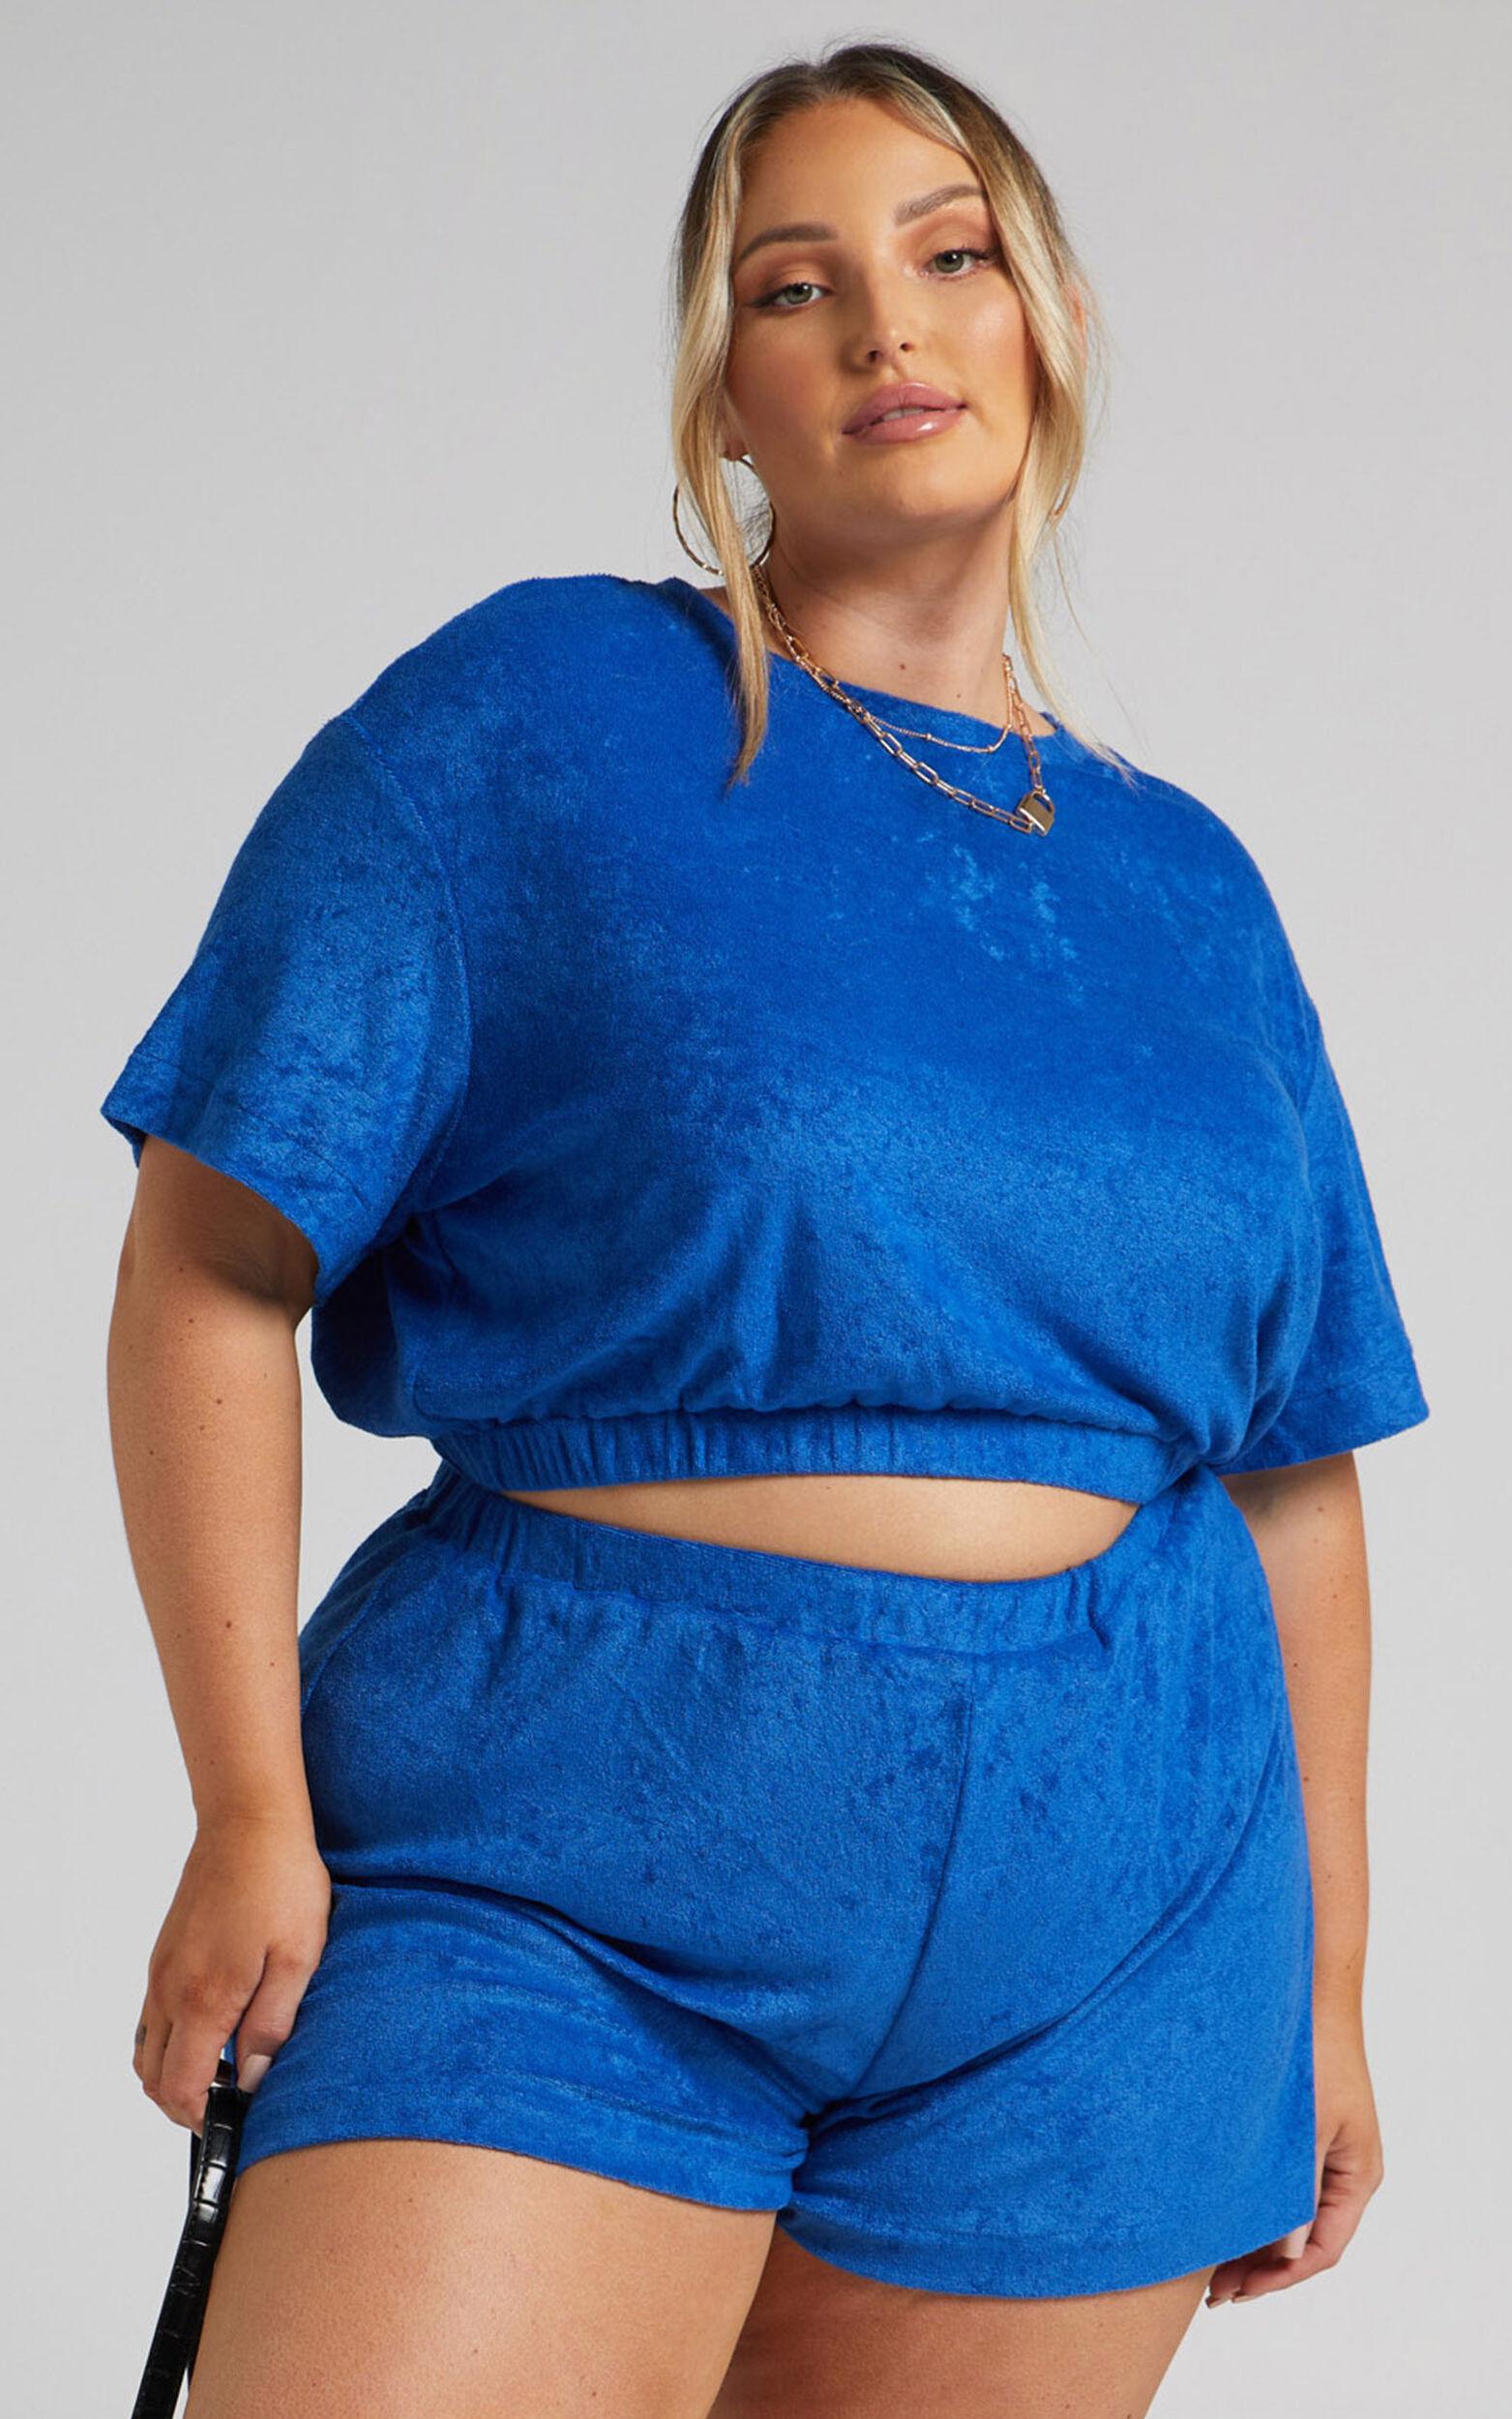 Giada Elasticated Shorts in Blue - 04, BLU1, super-hi-res image number null